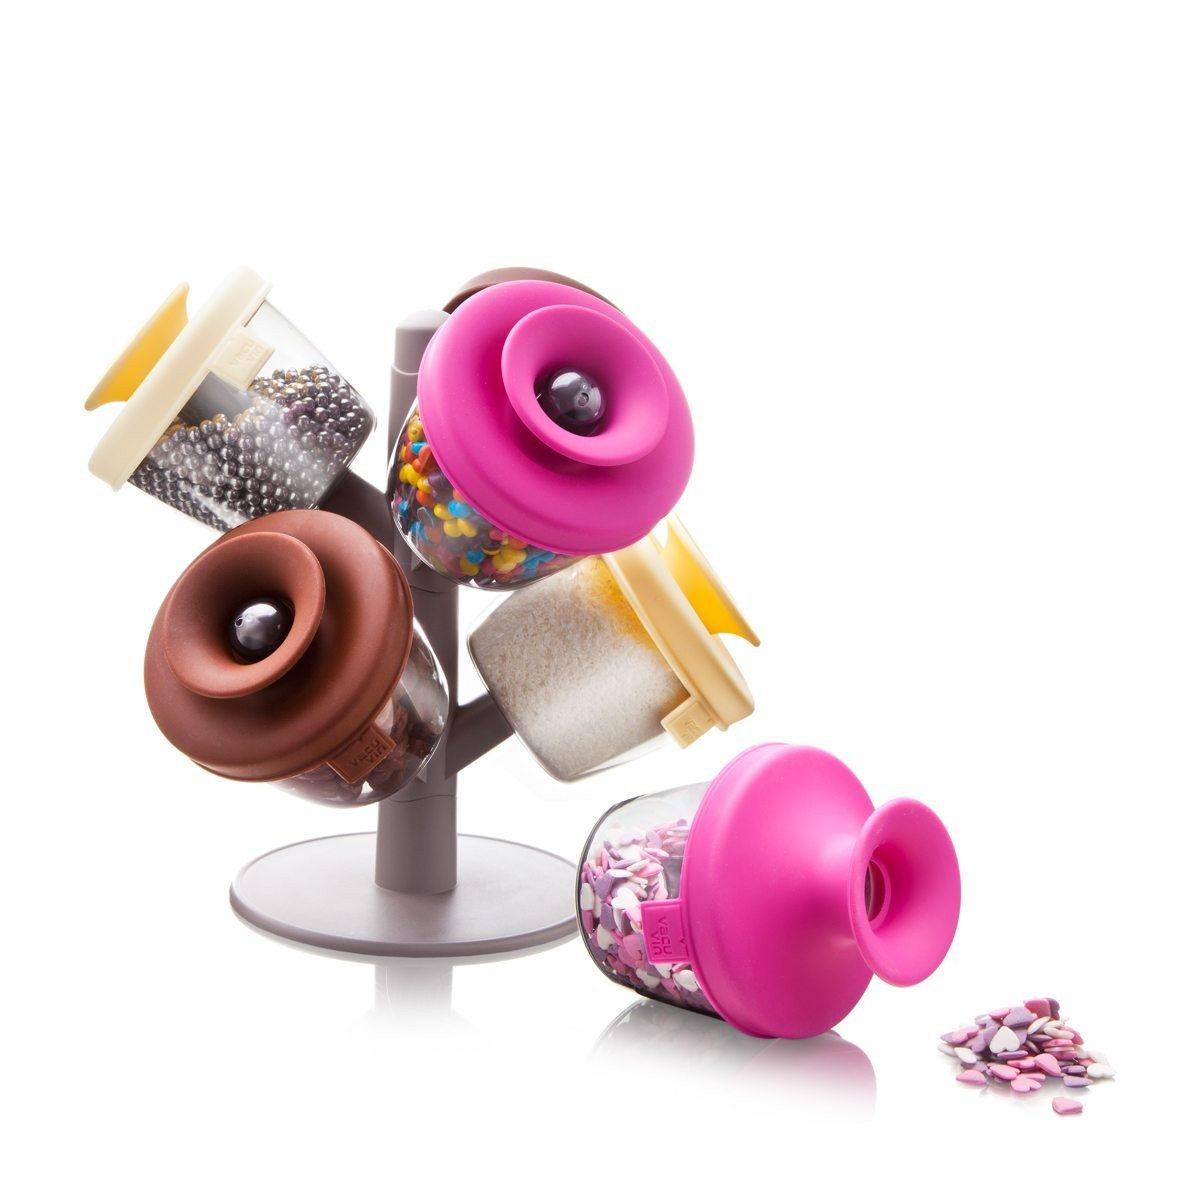 PopSome - Süßes Set zur Kuchendeko